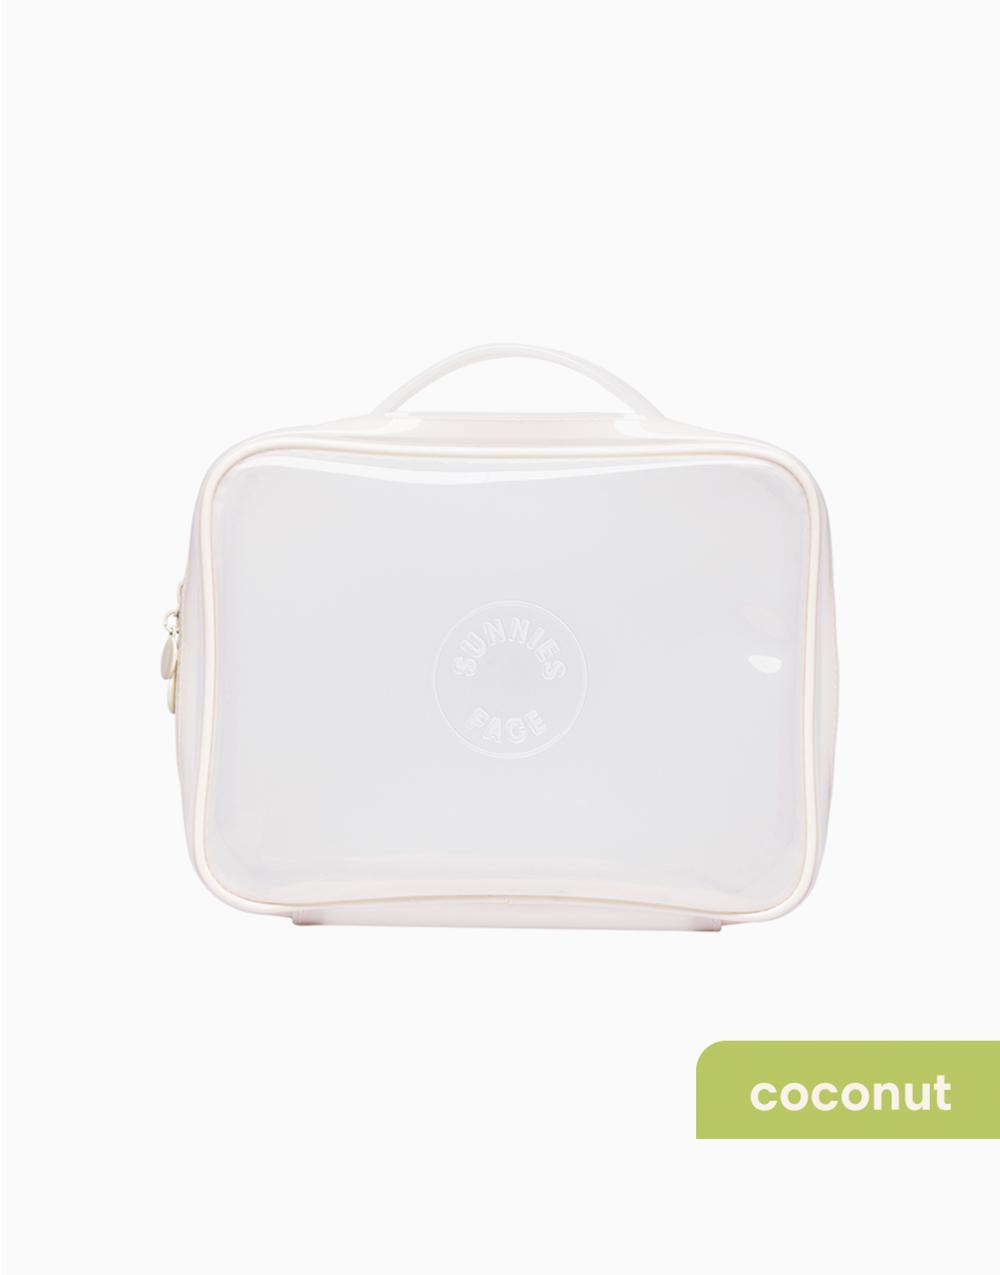 Sunnies Face Weekend Jelly Bag [Makeup Bag] (Coconut) by Sunnies Face